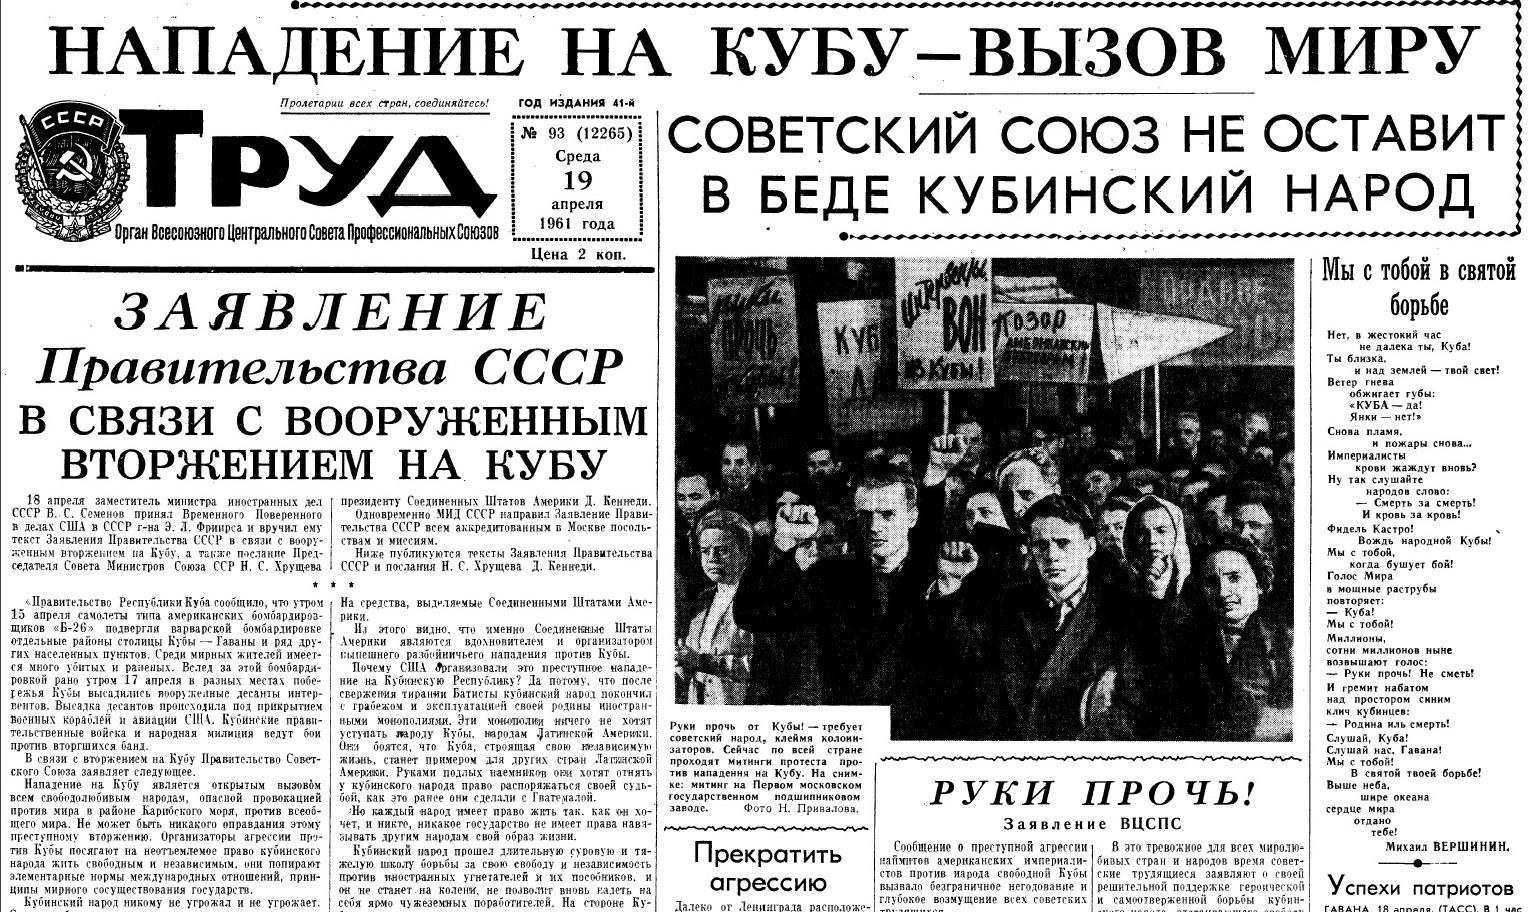 Кубанаш, 57 лет назад